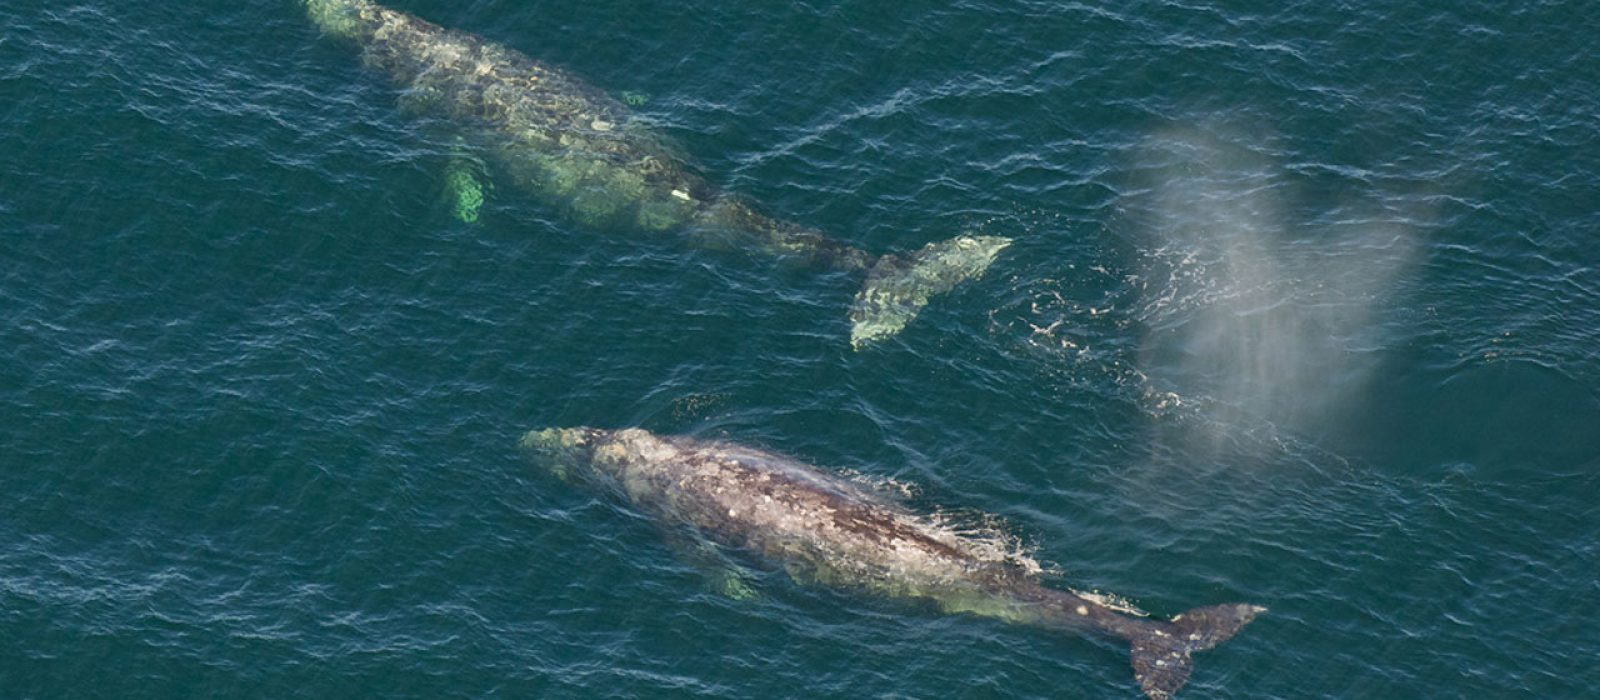 Whales in the ocean near Tofino, BC